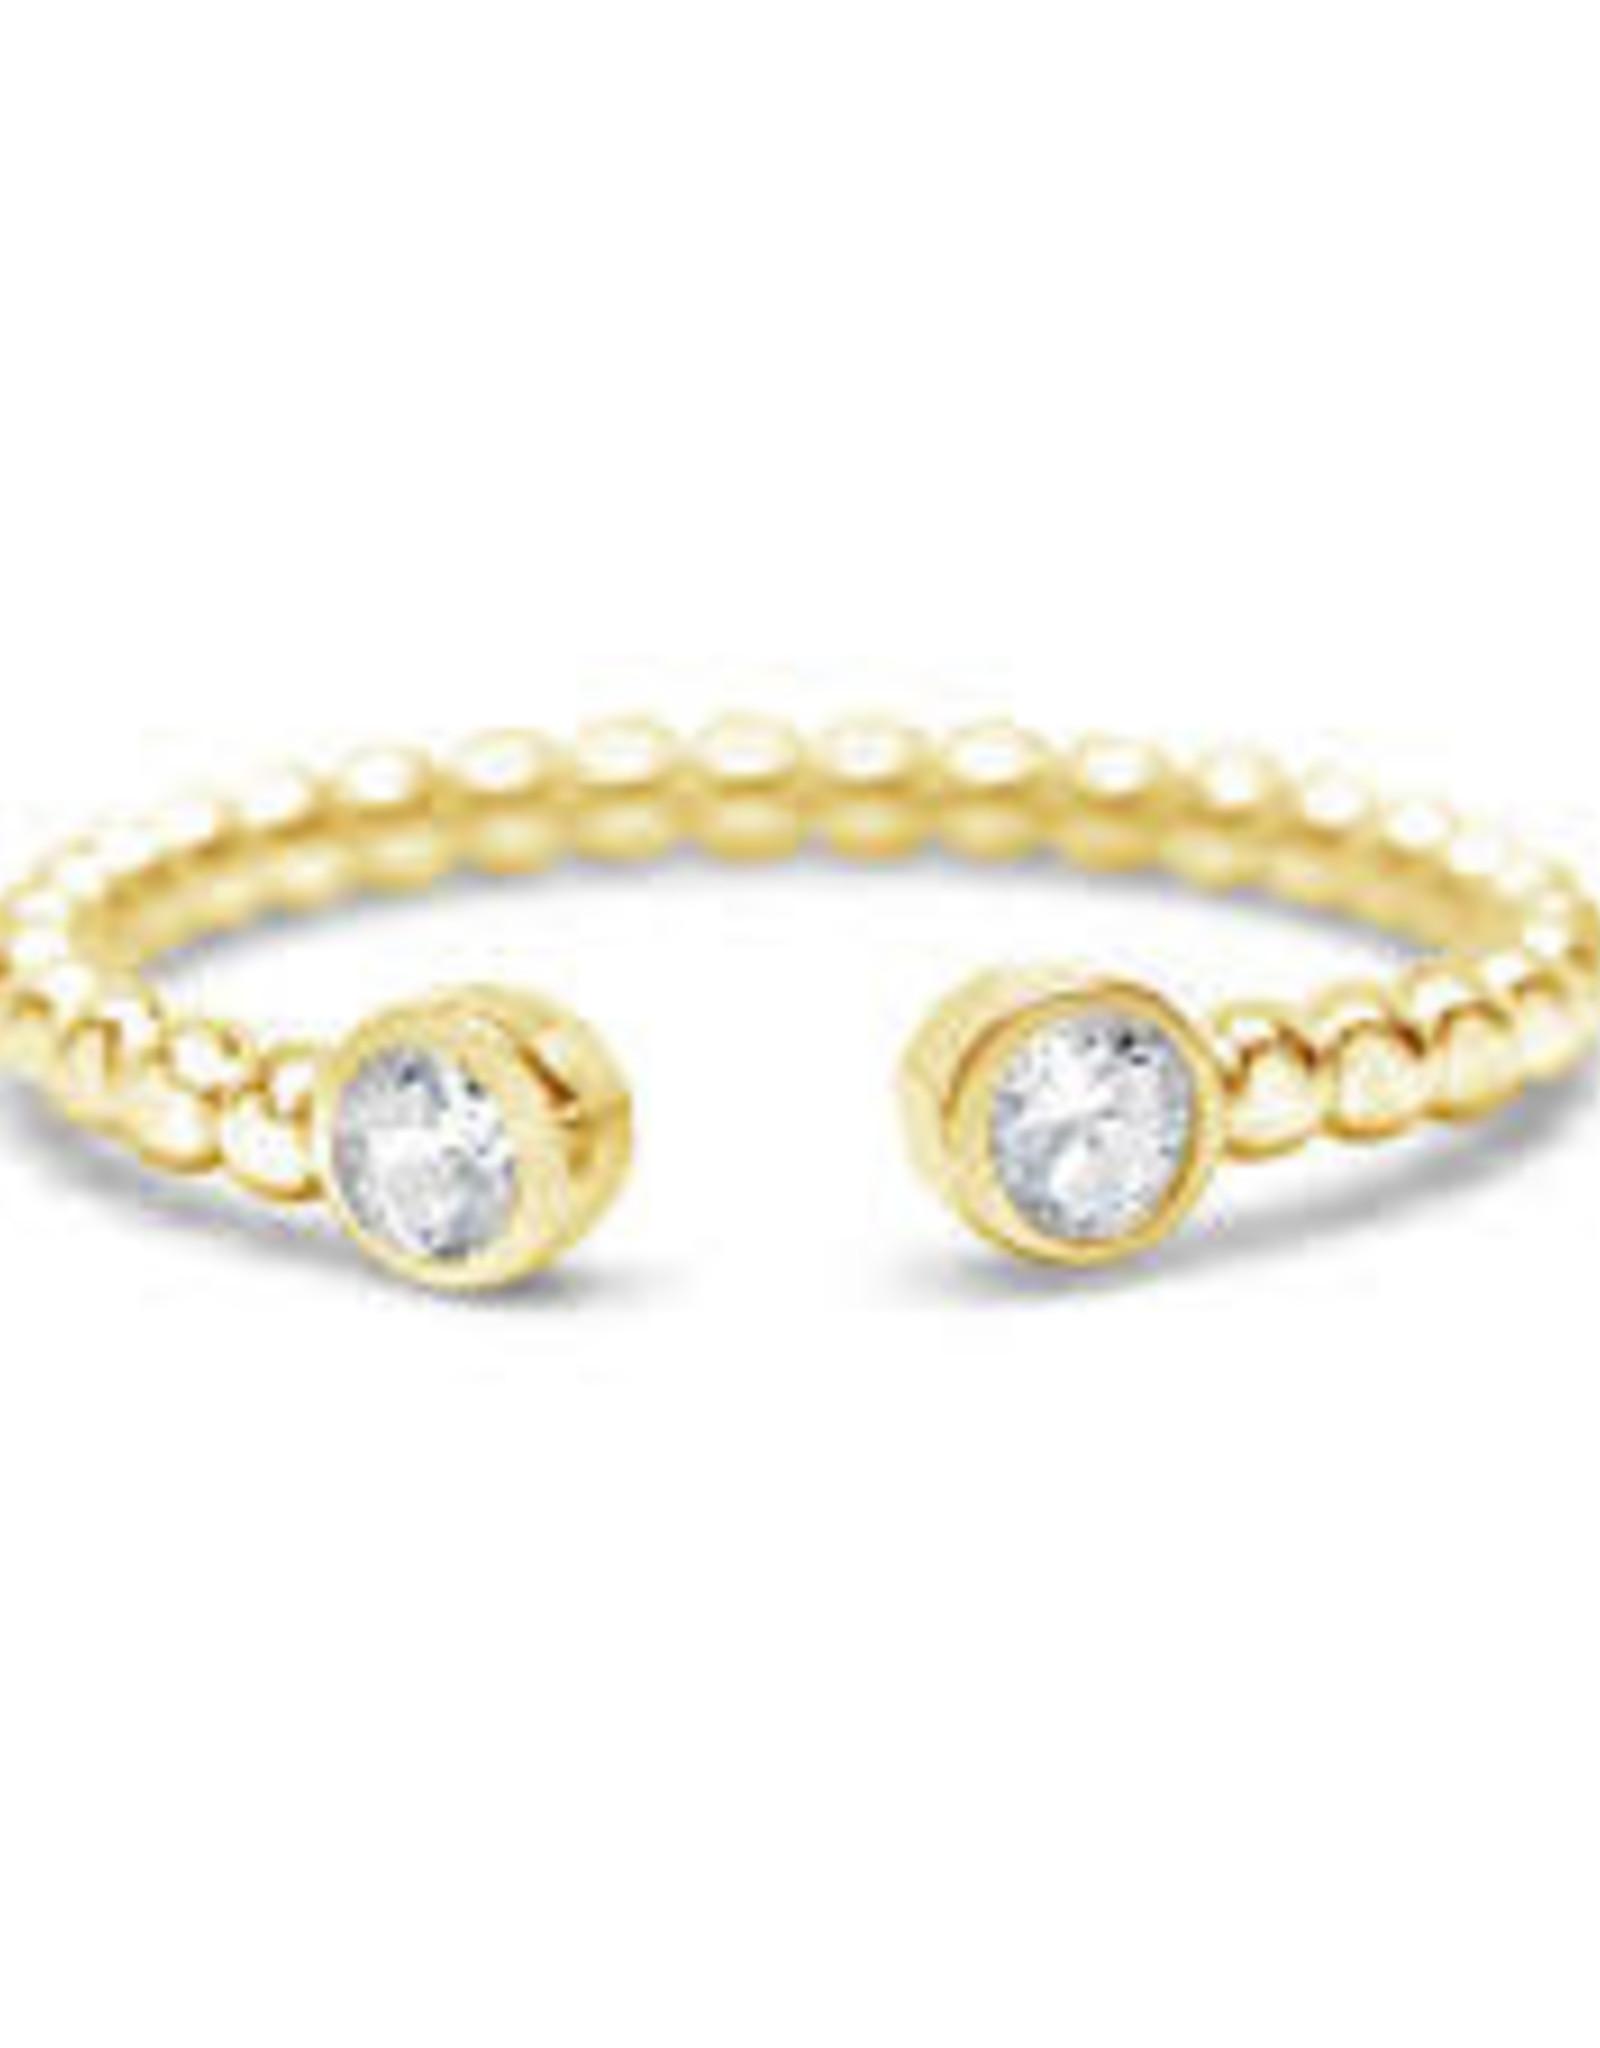 Stia Jewelry Droplet Wire Ring - CZ Bezel Cuff G